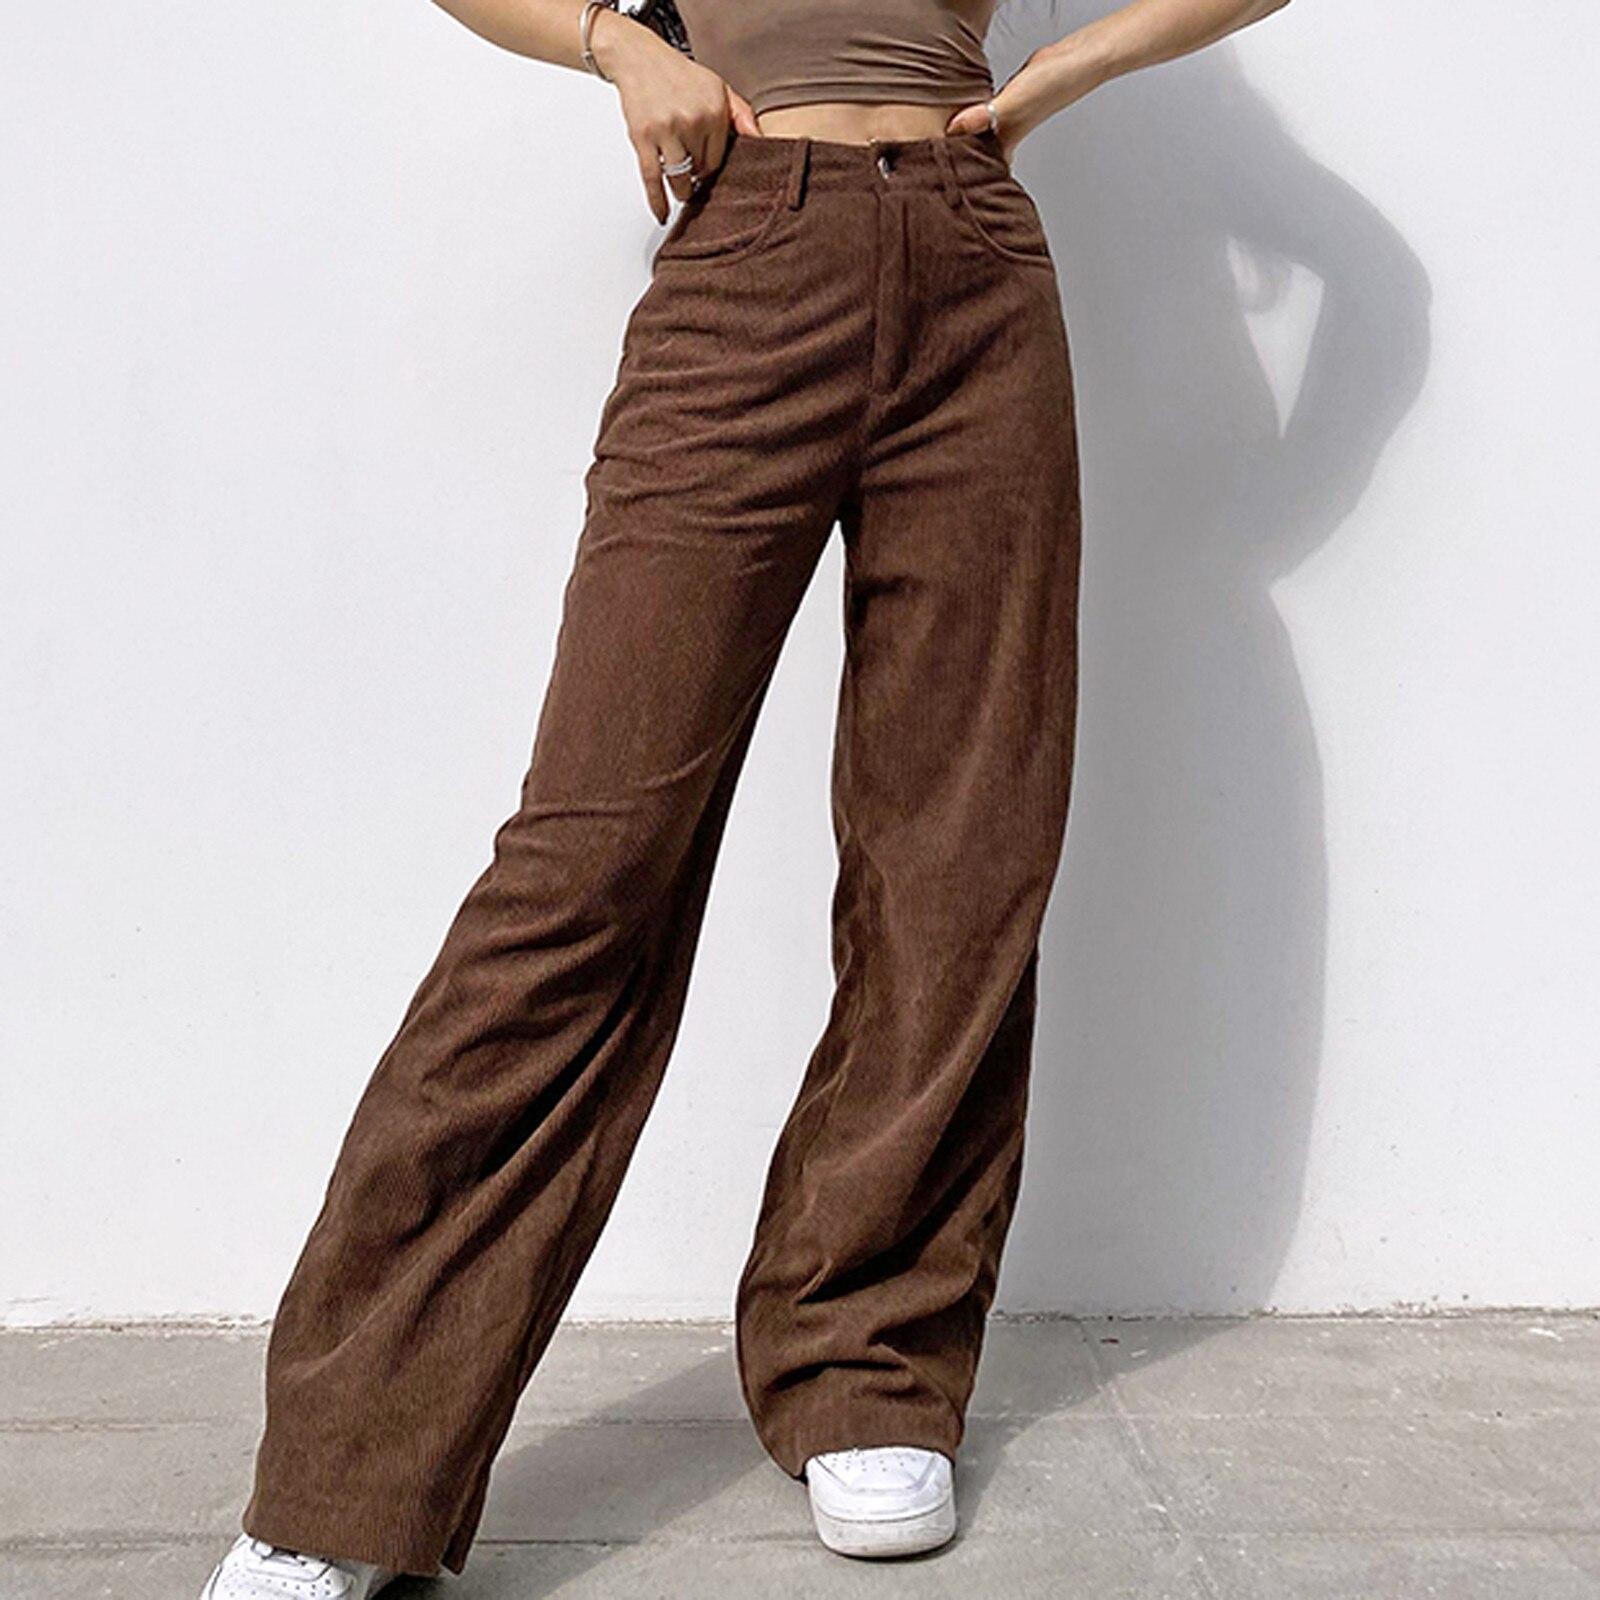 Calças de veludo feminino vintage 90s indie streetwear adolescente skater estilo menina calças largas moda cintura alta calças marrons # f30